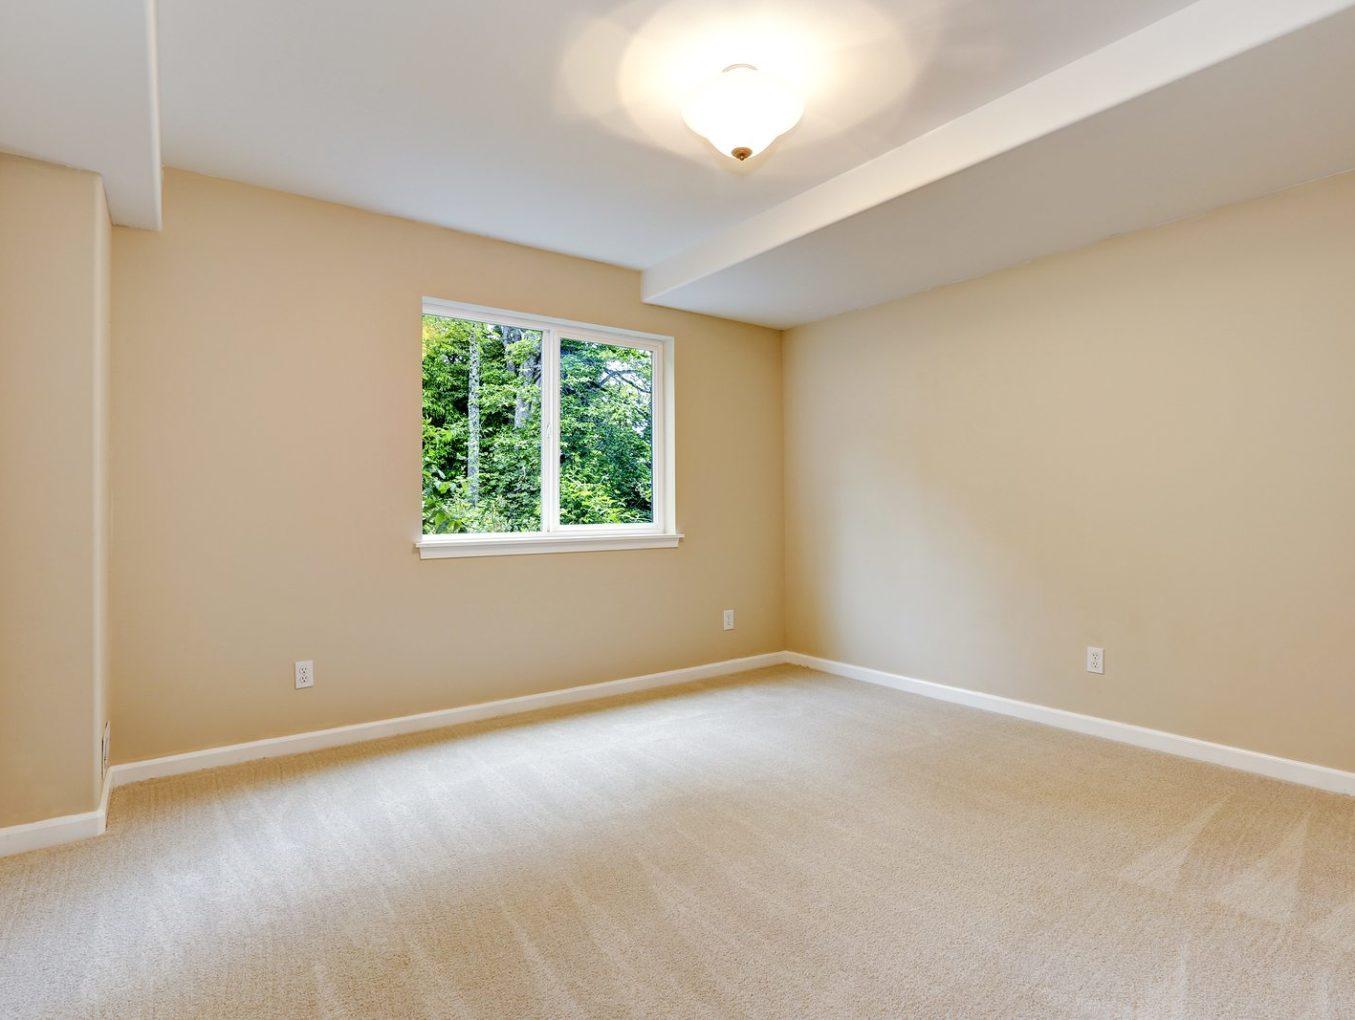 Room Addition Contractor in Burbank CA